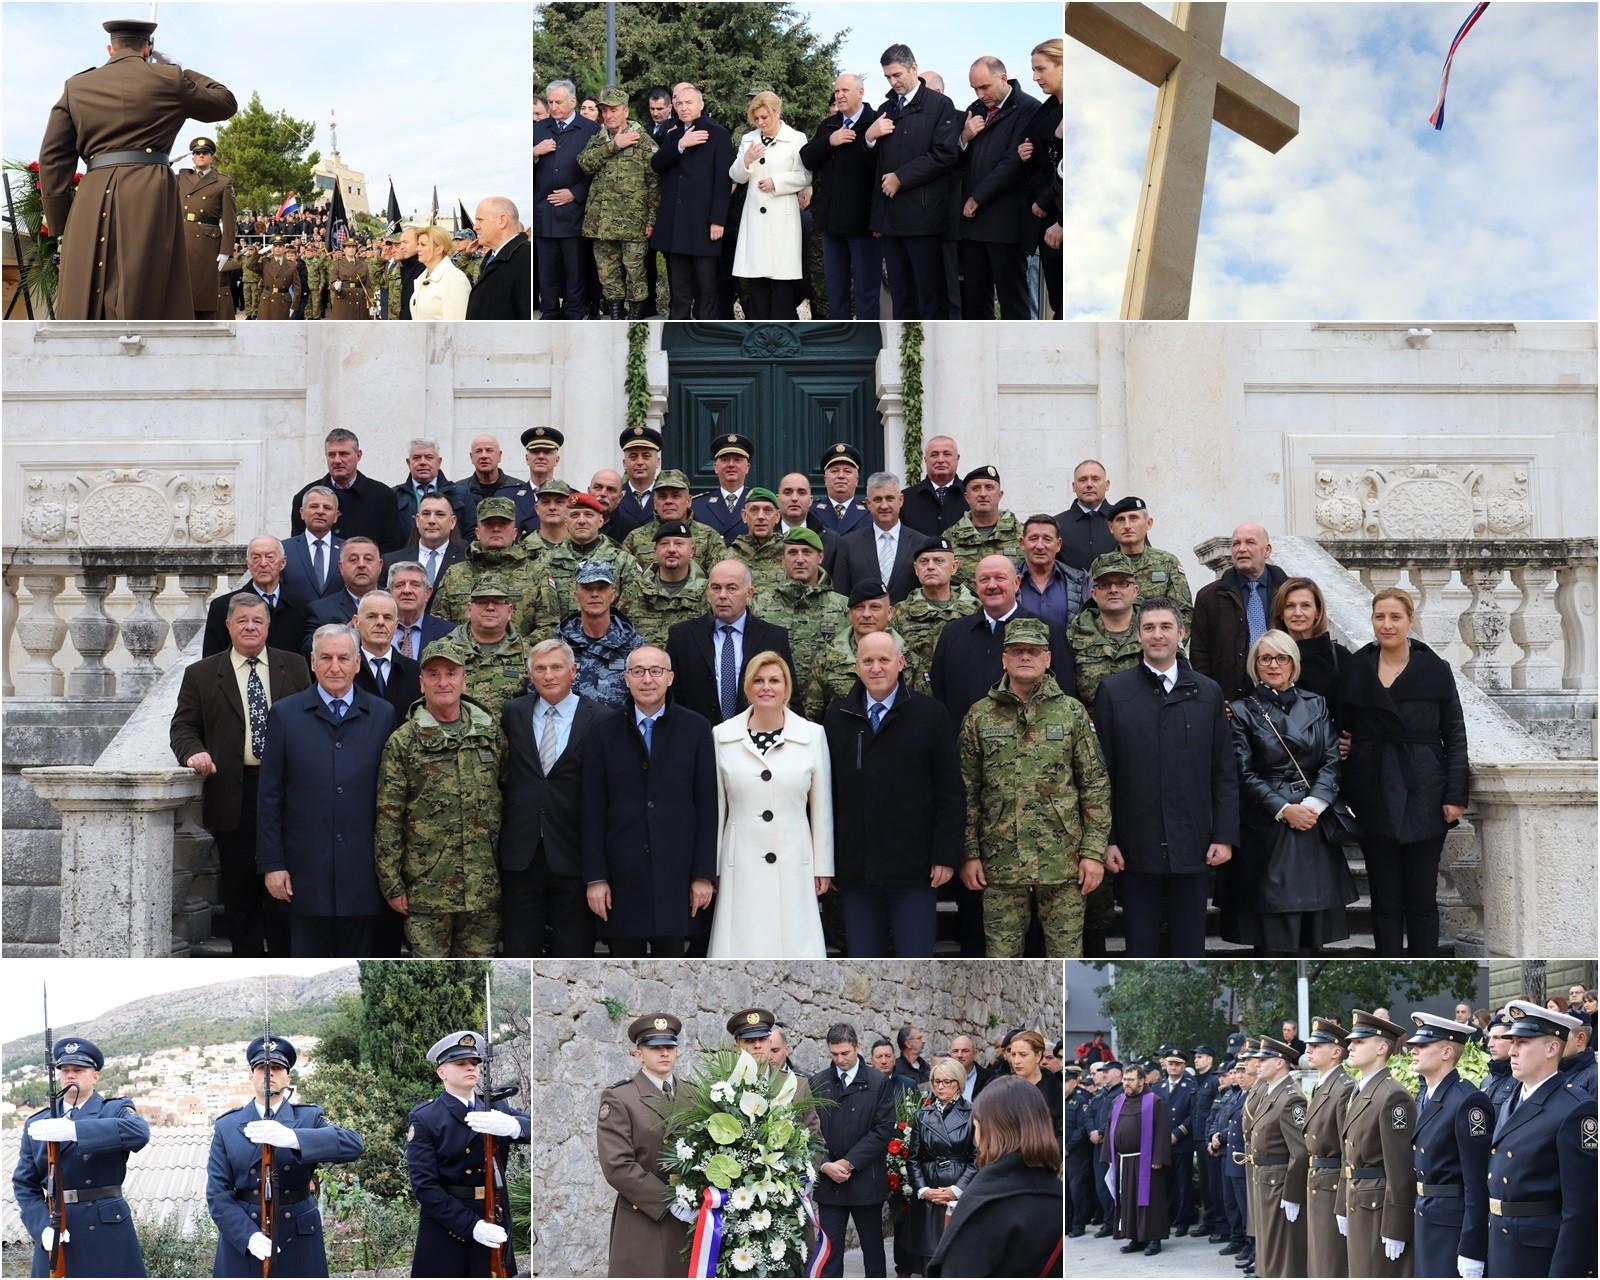 TUGA I PONOS Dubrovnik obilježava Dan dubrovačkih branitelja